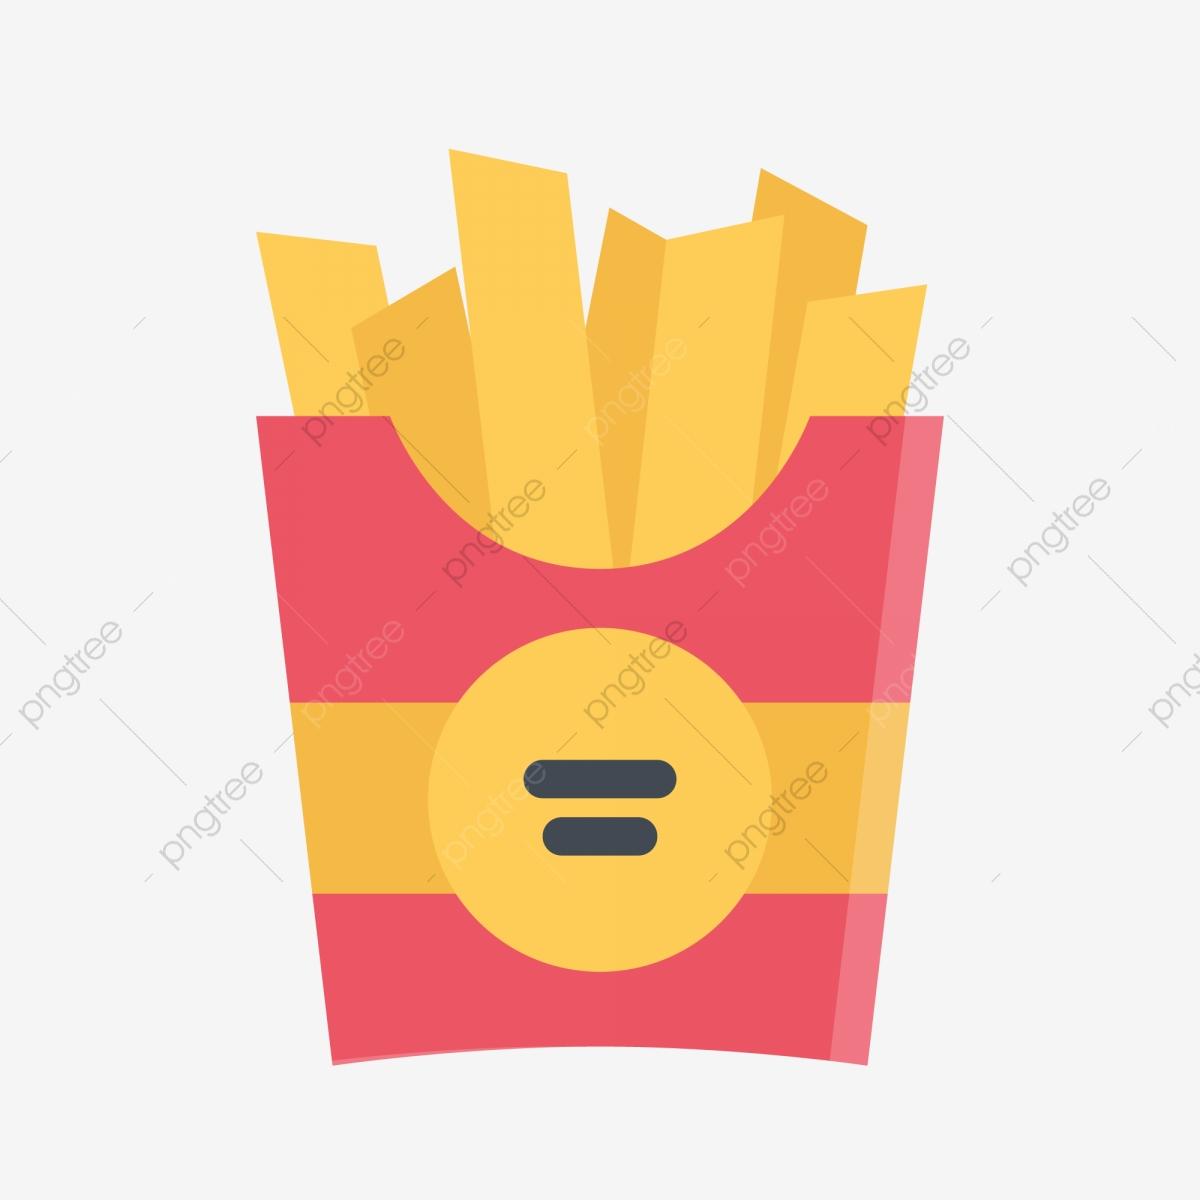 French fries potato food. Mcdonalds clipart icon